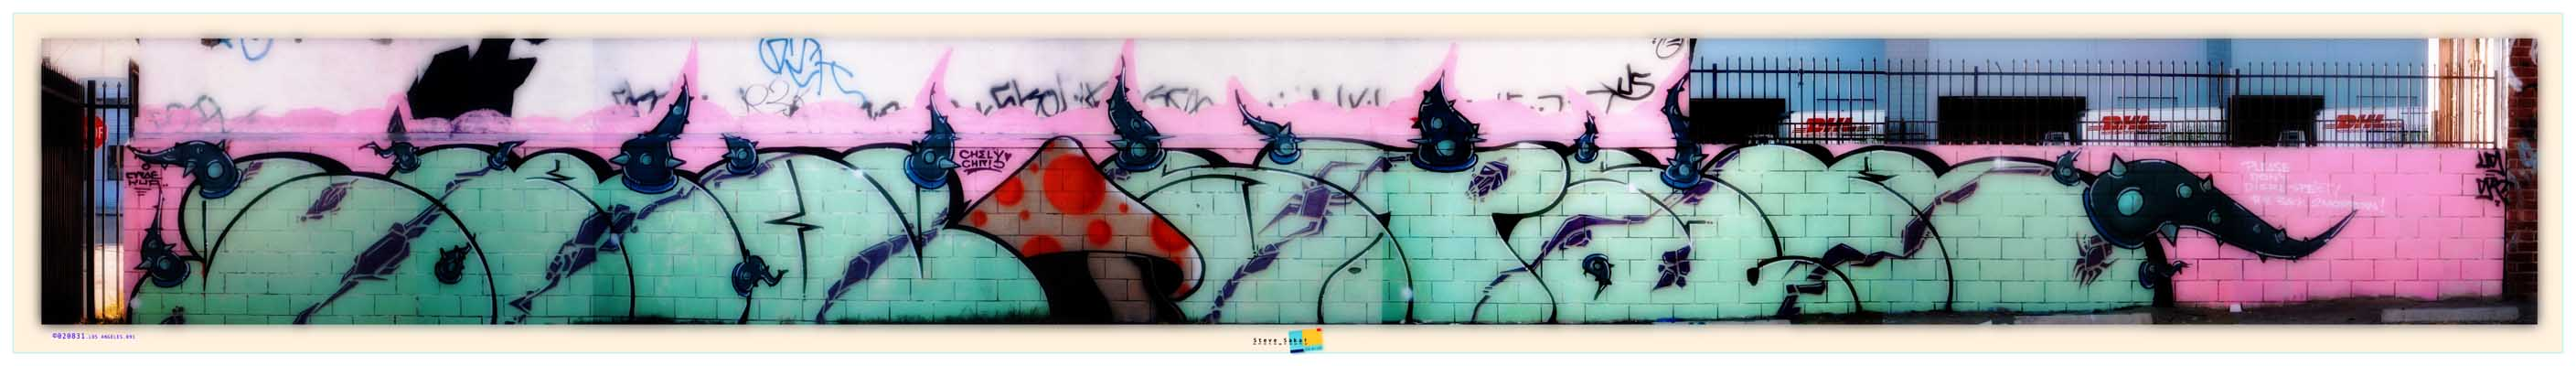 awww.graffiti.org_la_091.020831.la.v02.jpg